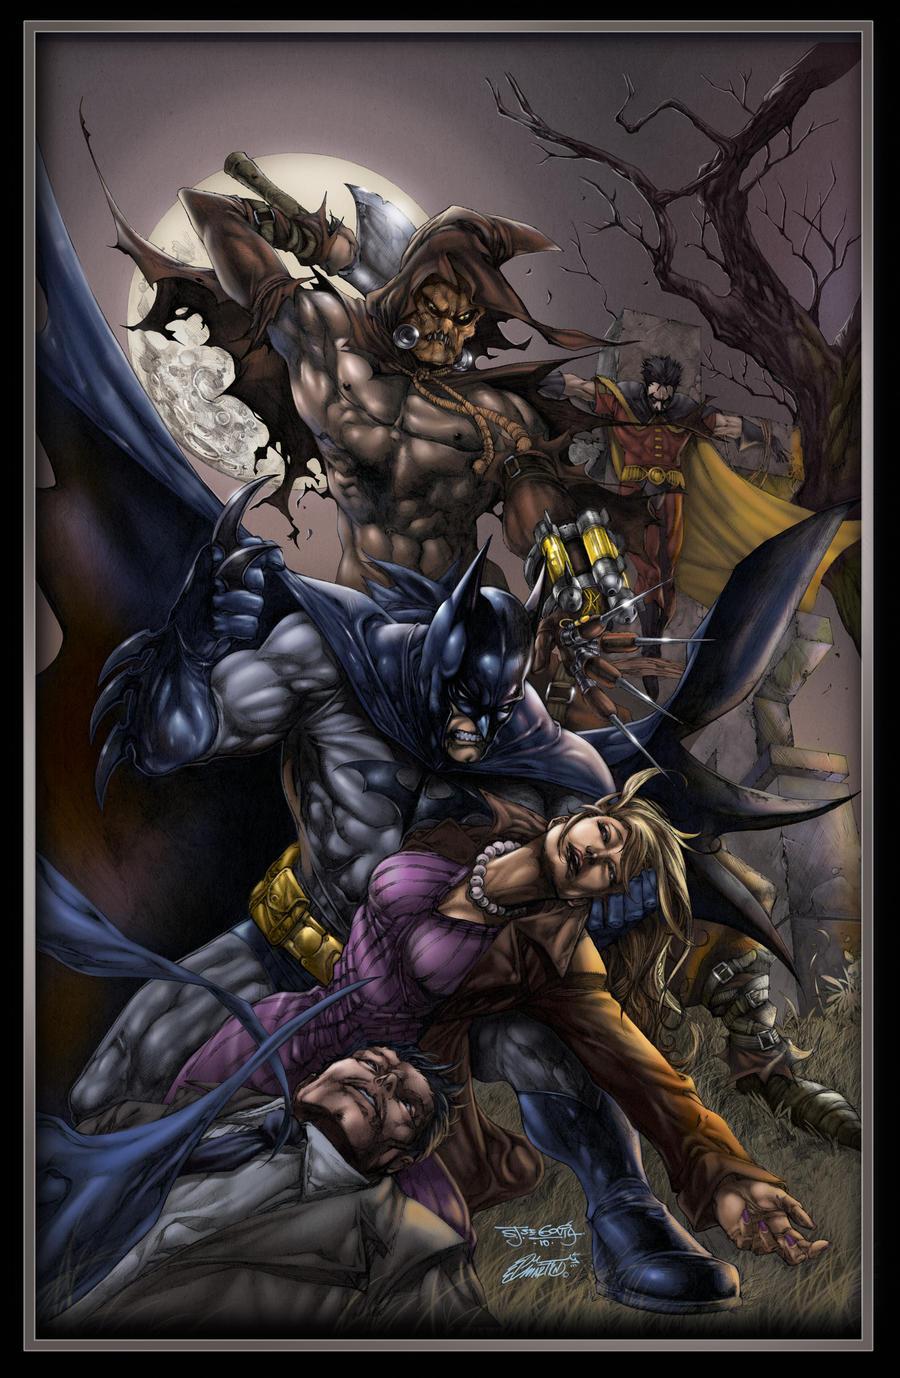 Batman vs scarecrow colors by aladecuervo